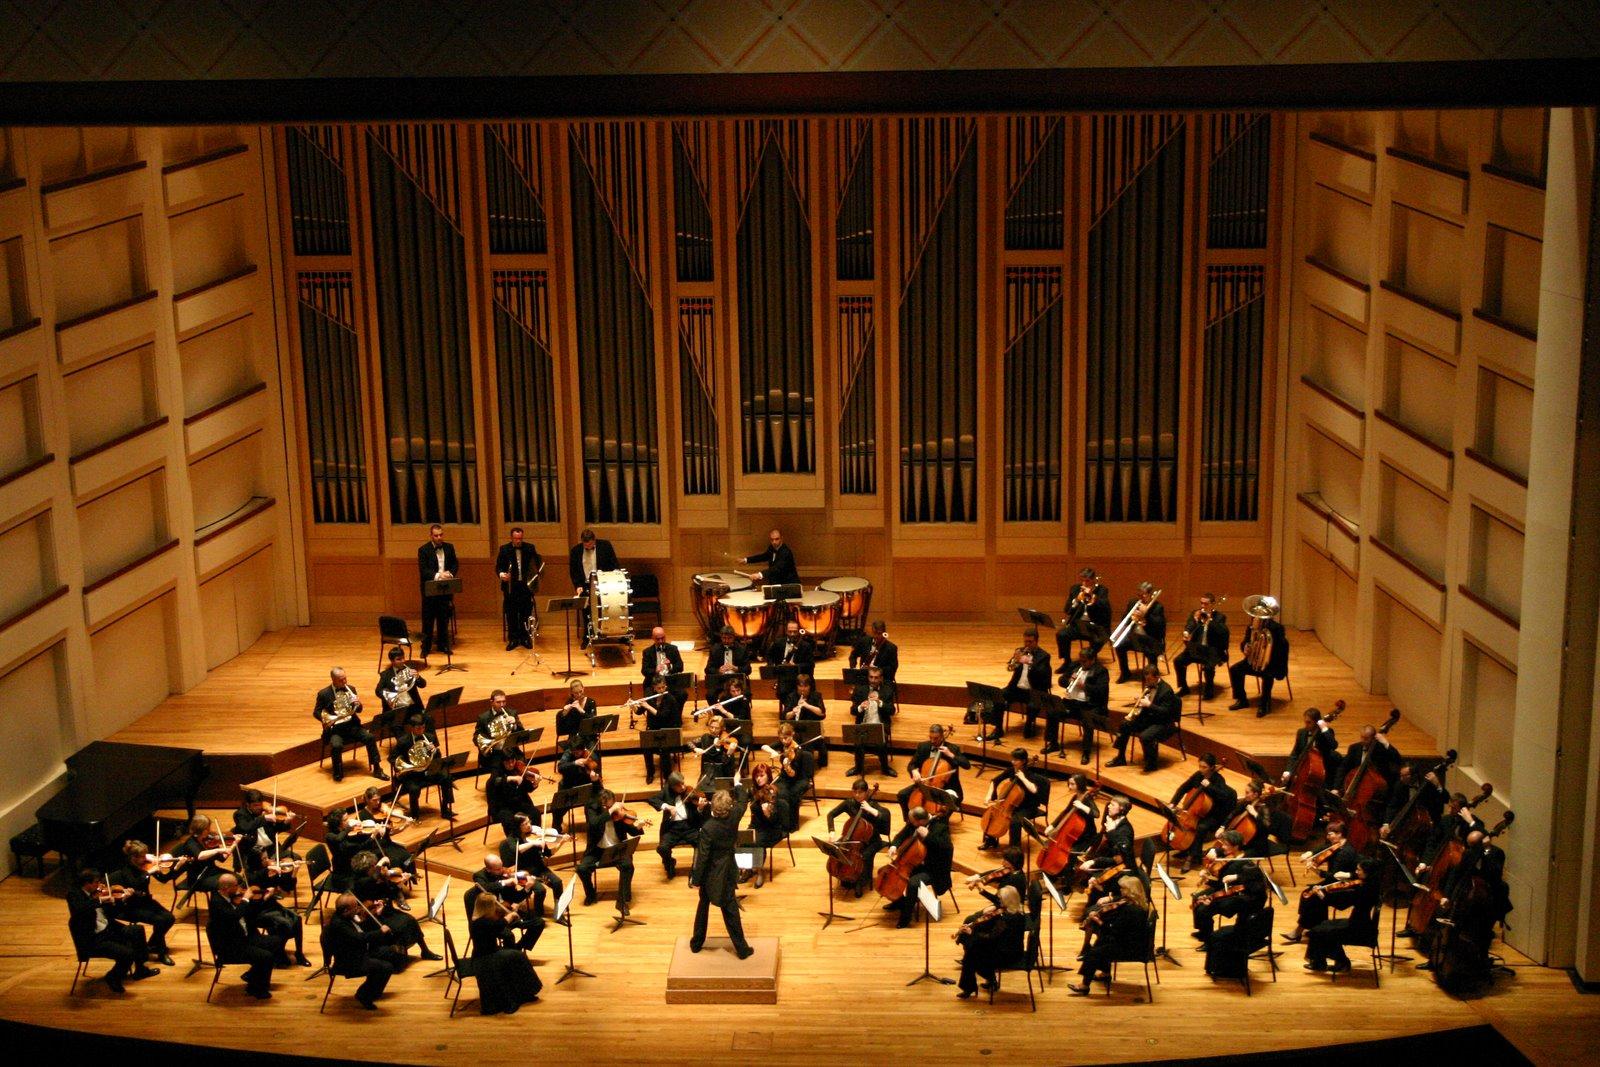 Dublin_Philharmonic_Orchestra_performing_Tchaikovsky's_Symphony_No_4_in_Charlotte,_North_Carolina.jpg